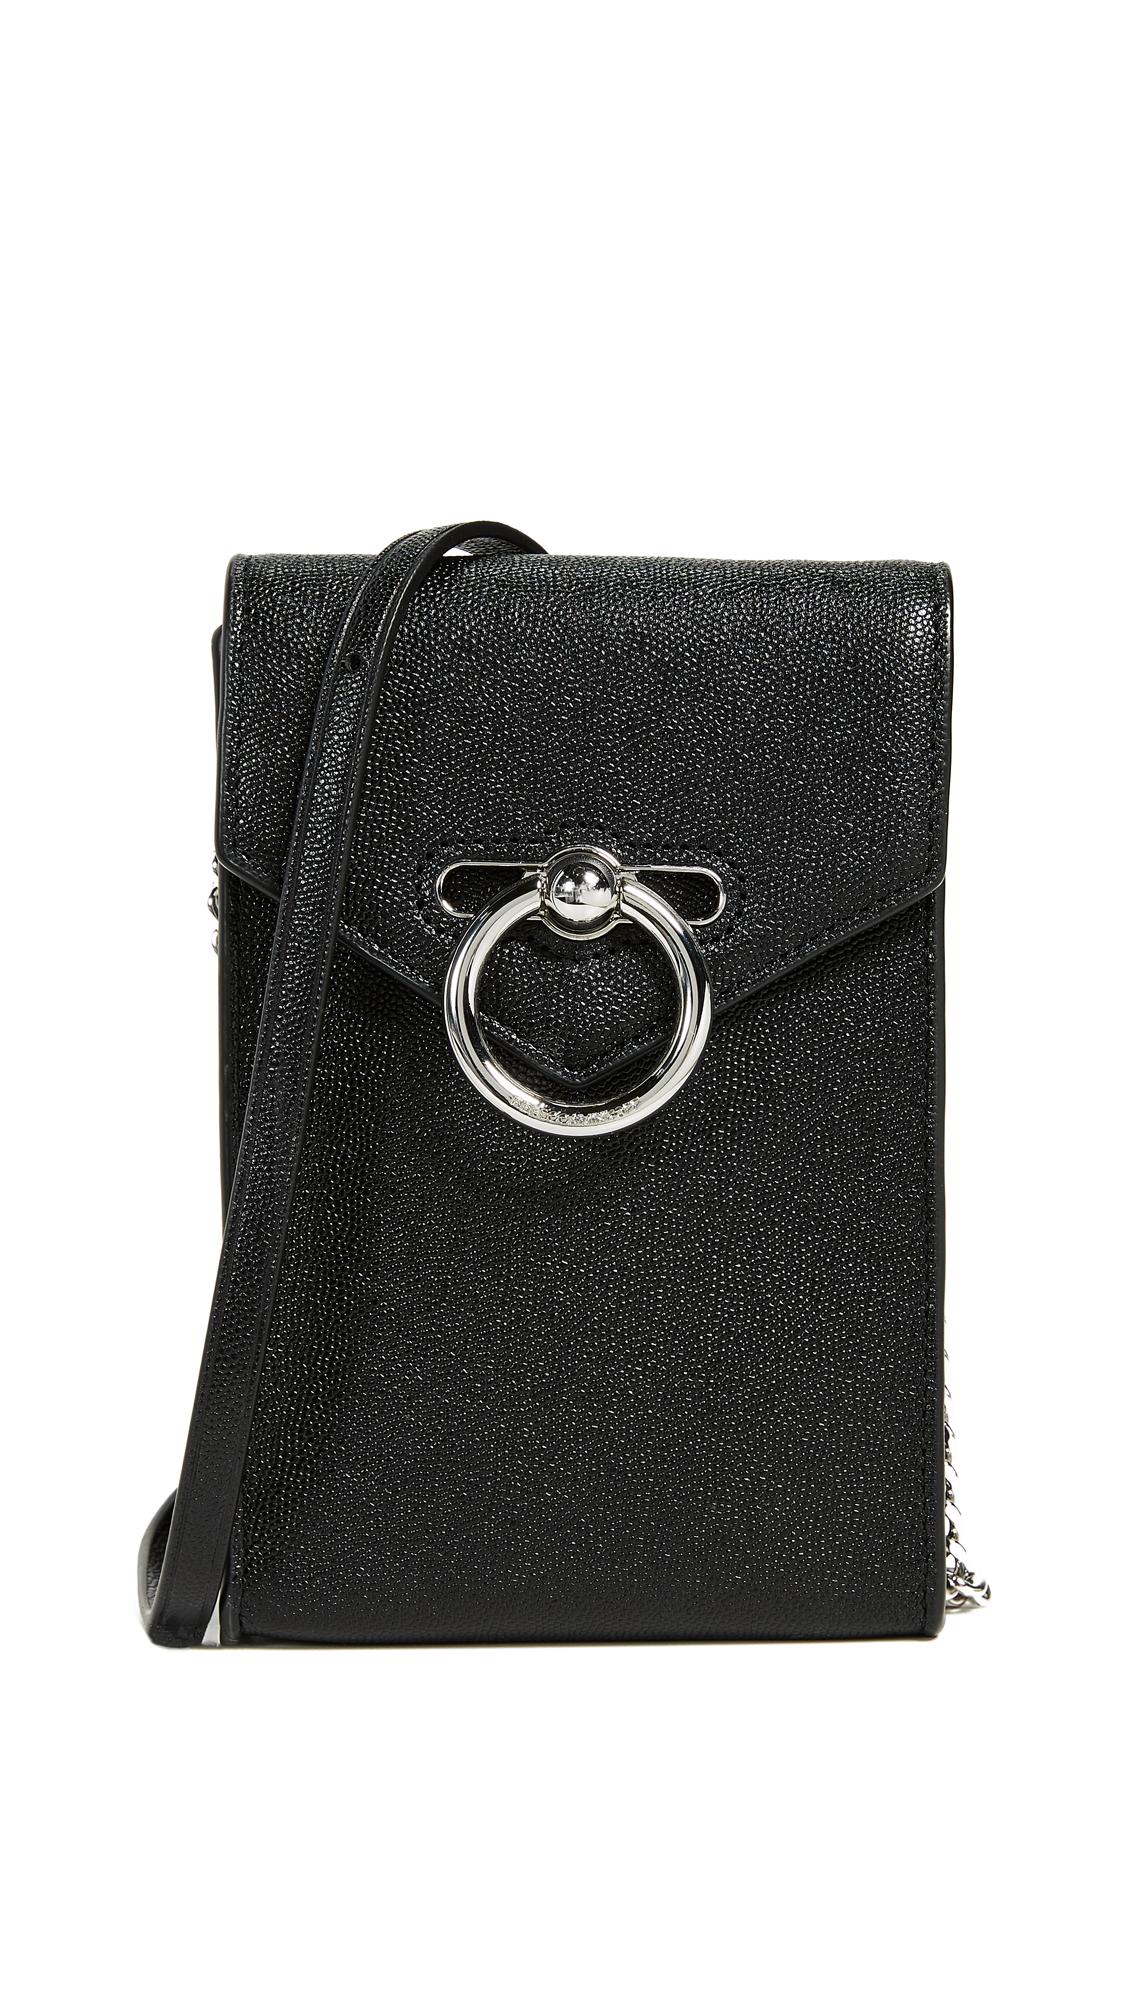 d70bcbb9d7496 Rebecca Minkoff Jean Phone Crossbody Bag In Black